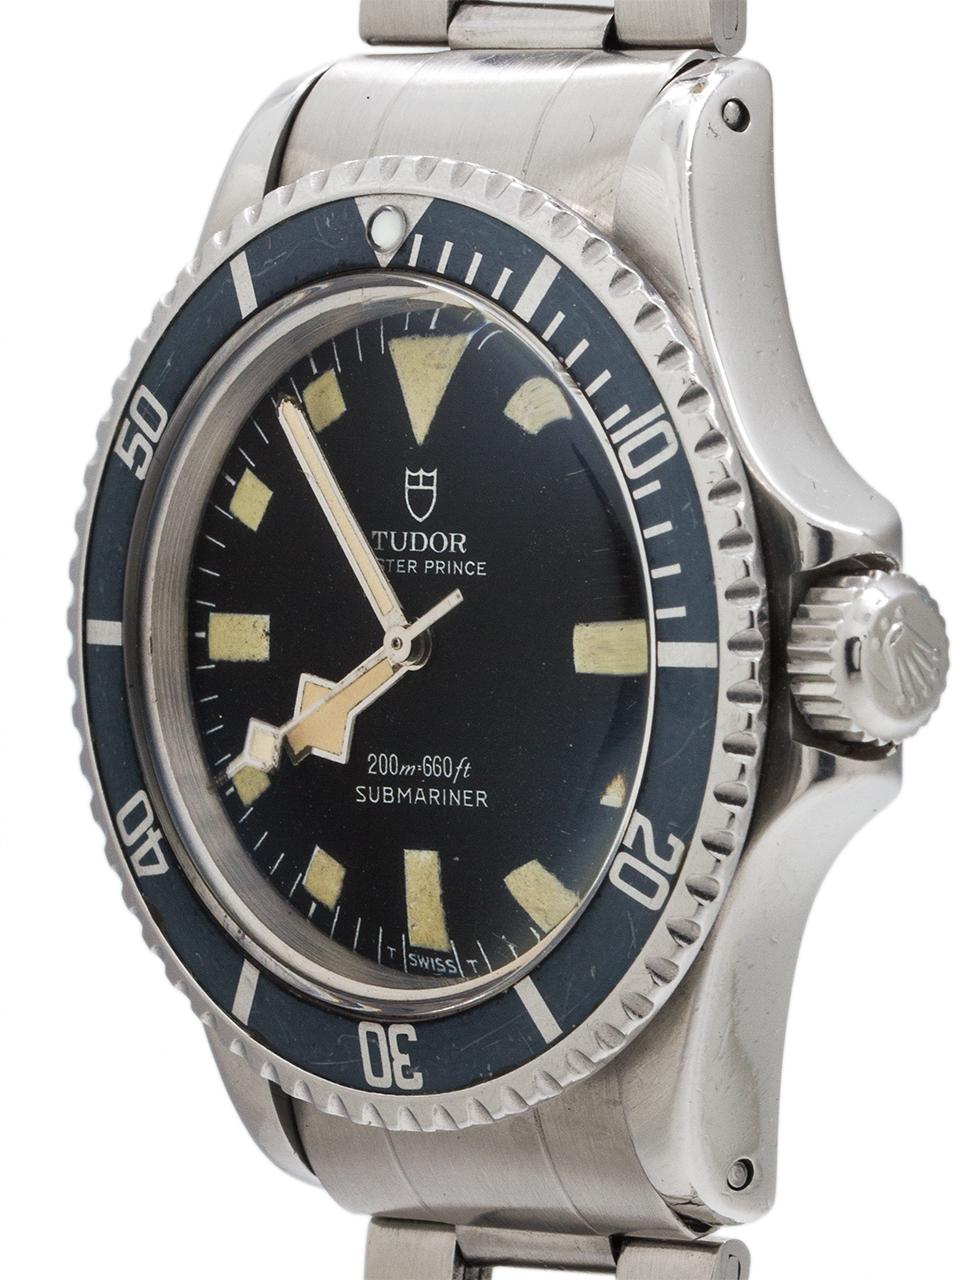 "Tudor ""Snowflake"" Submariner ref# 7016/0 circa 1974"